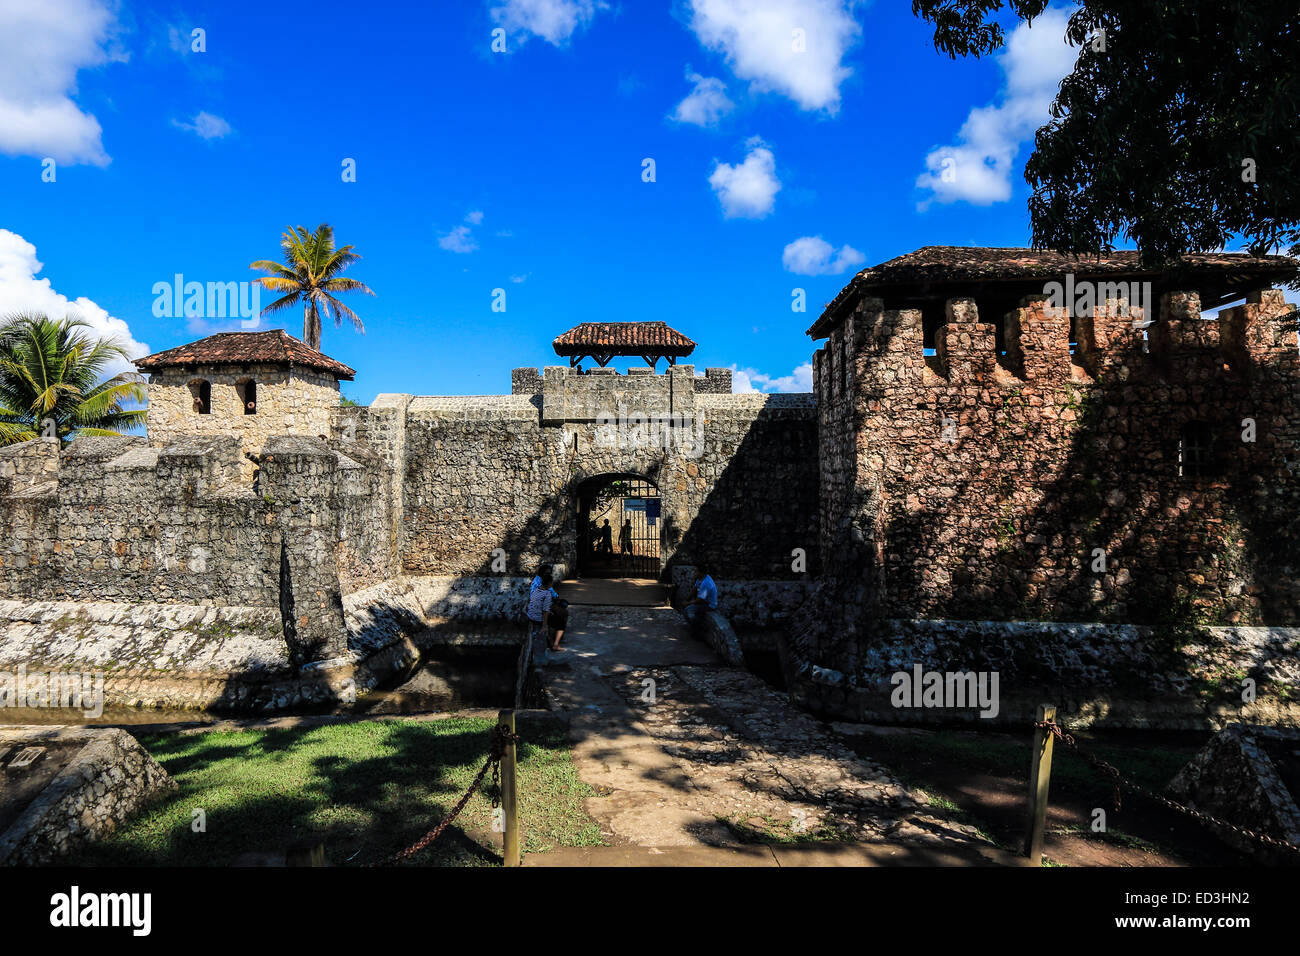 Entrance gate to Castillo de San Felipe de Lara, a fort located at the entrance to Lago Izabal in Rio Dulce, Guatemala. - Stock Image